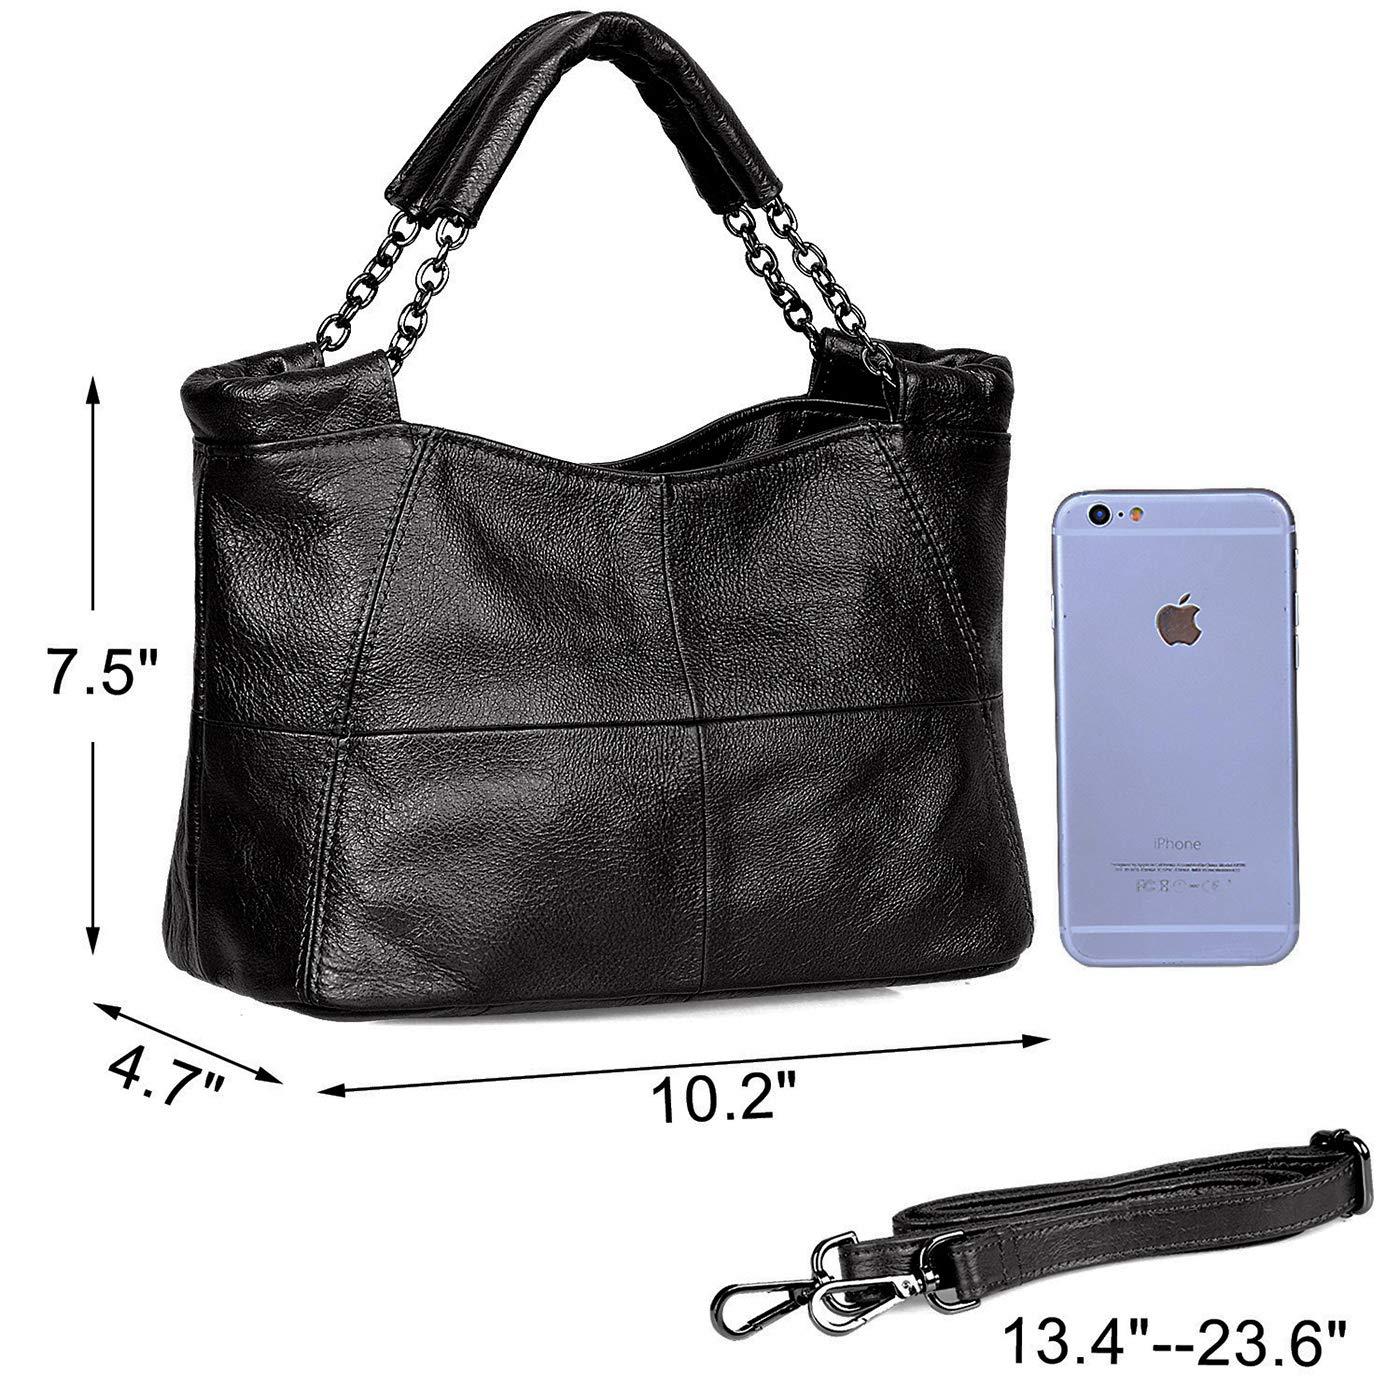 Amazon.com  Jack Chris Splicing Satchel Crossbody Bags for Women Leather  Top Handle Handbags c1cd620a0d306